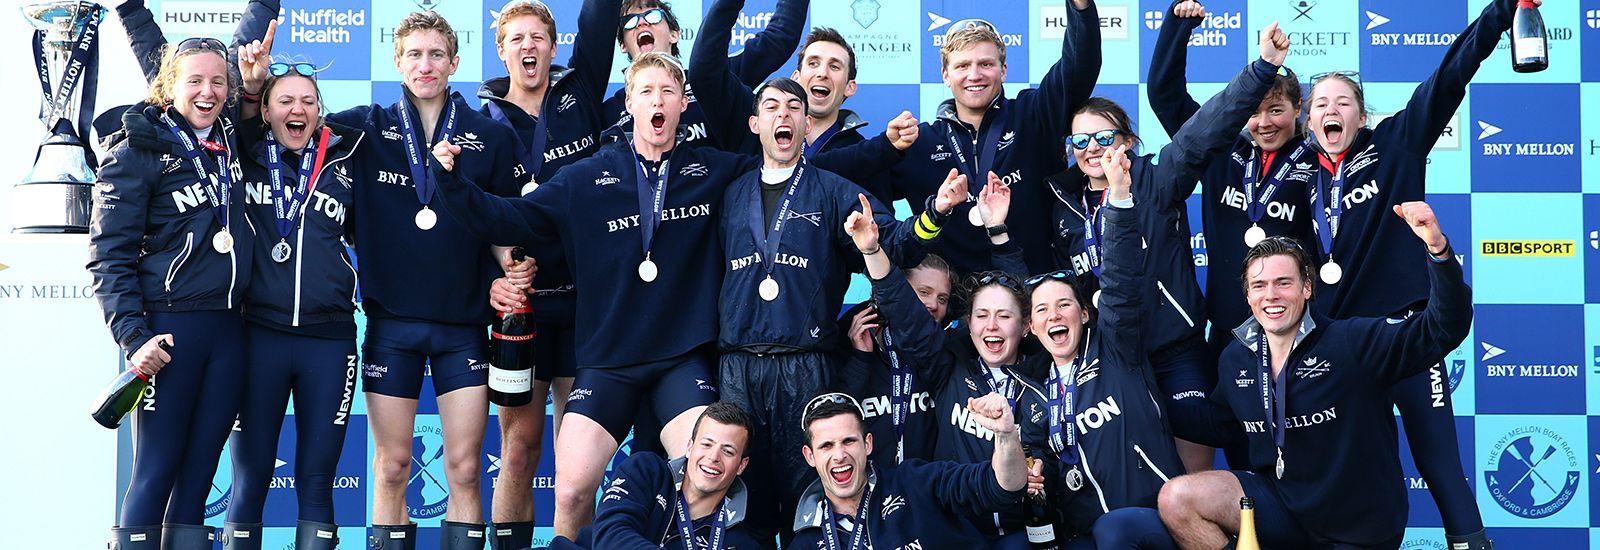 Oxford's 2015 winning teams